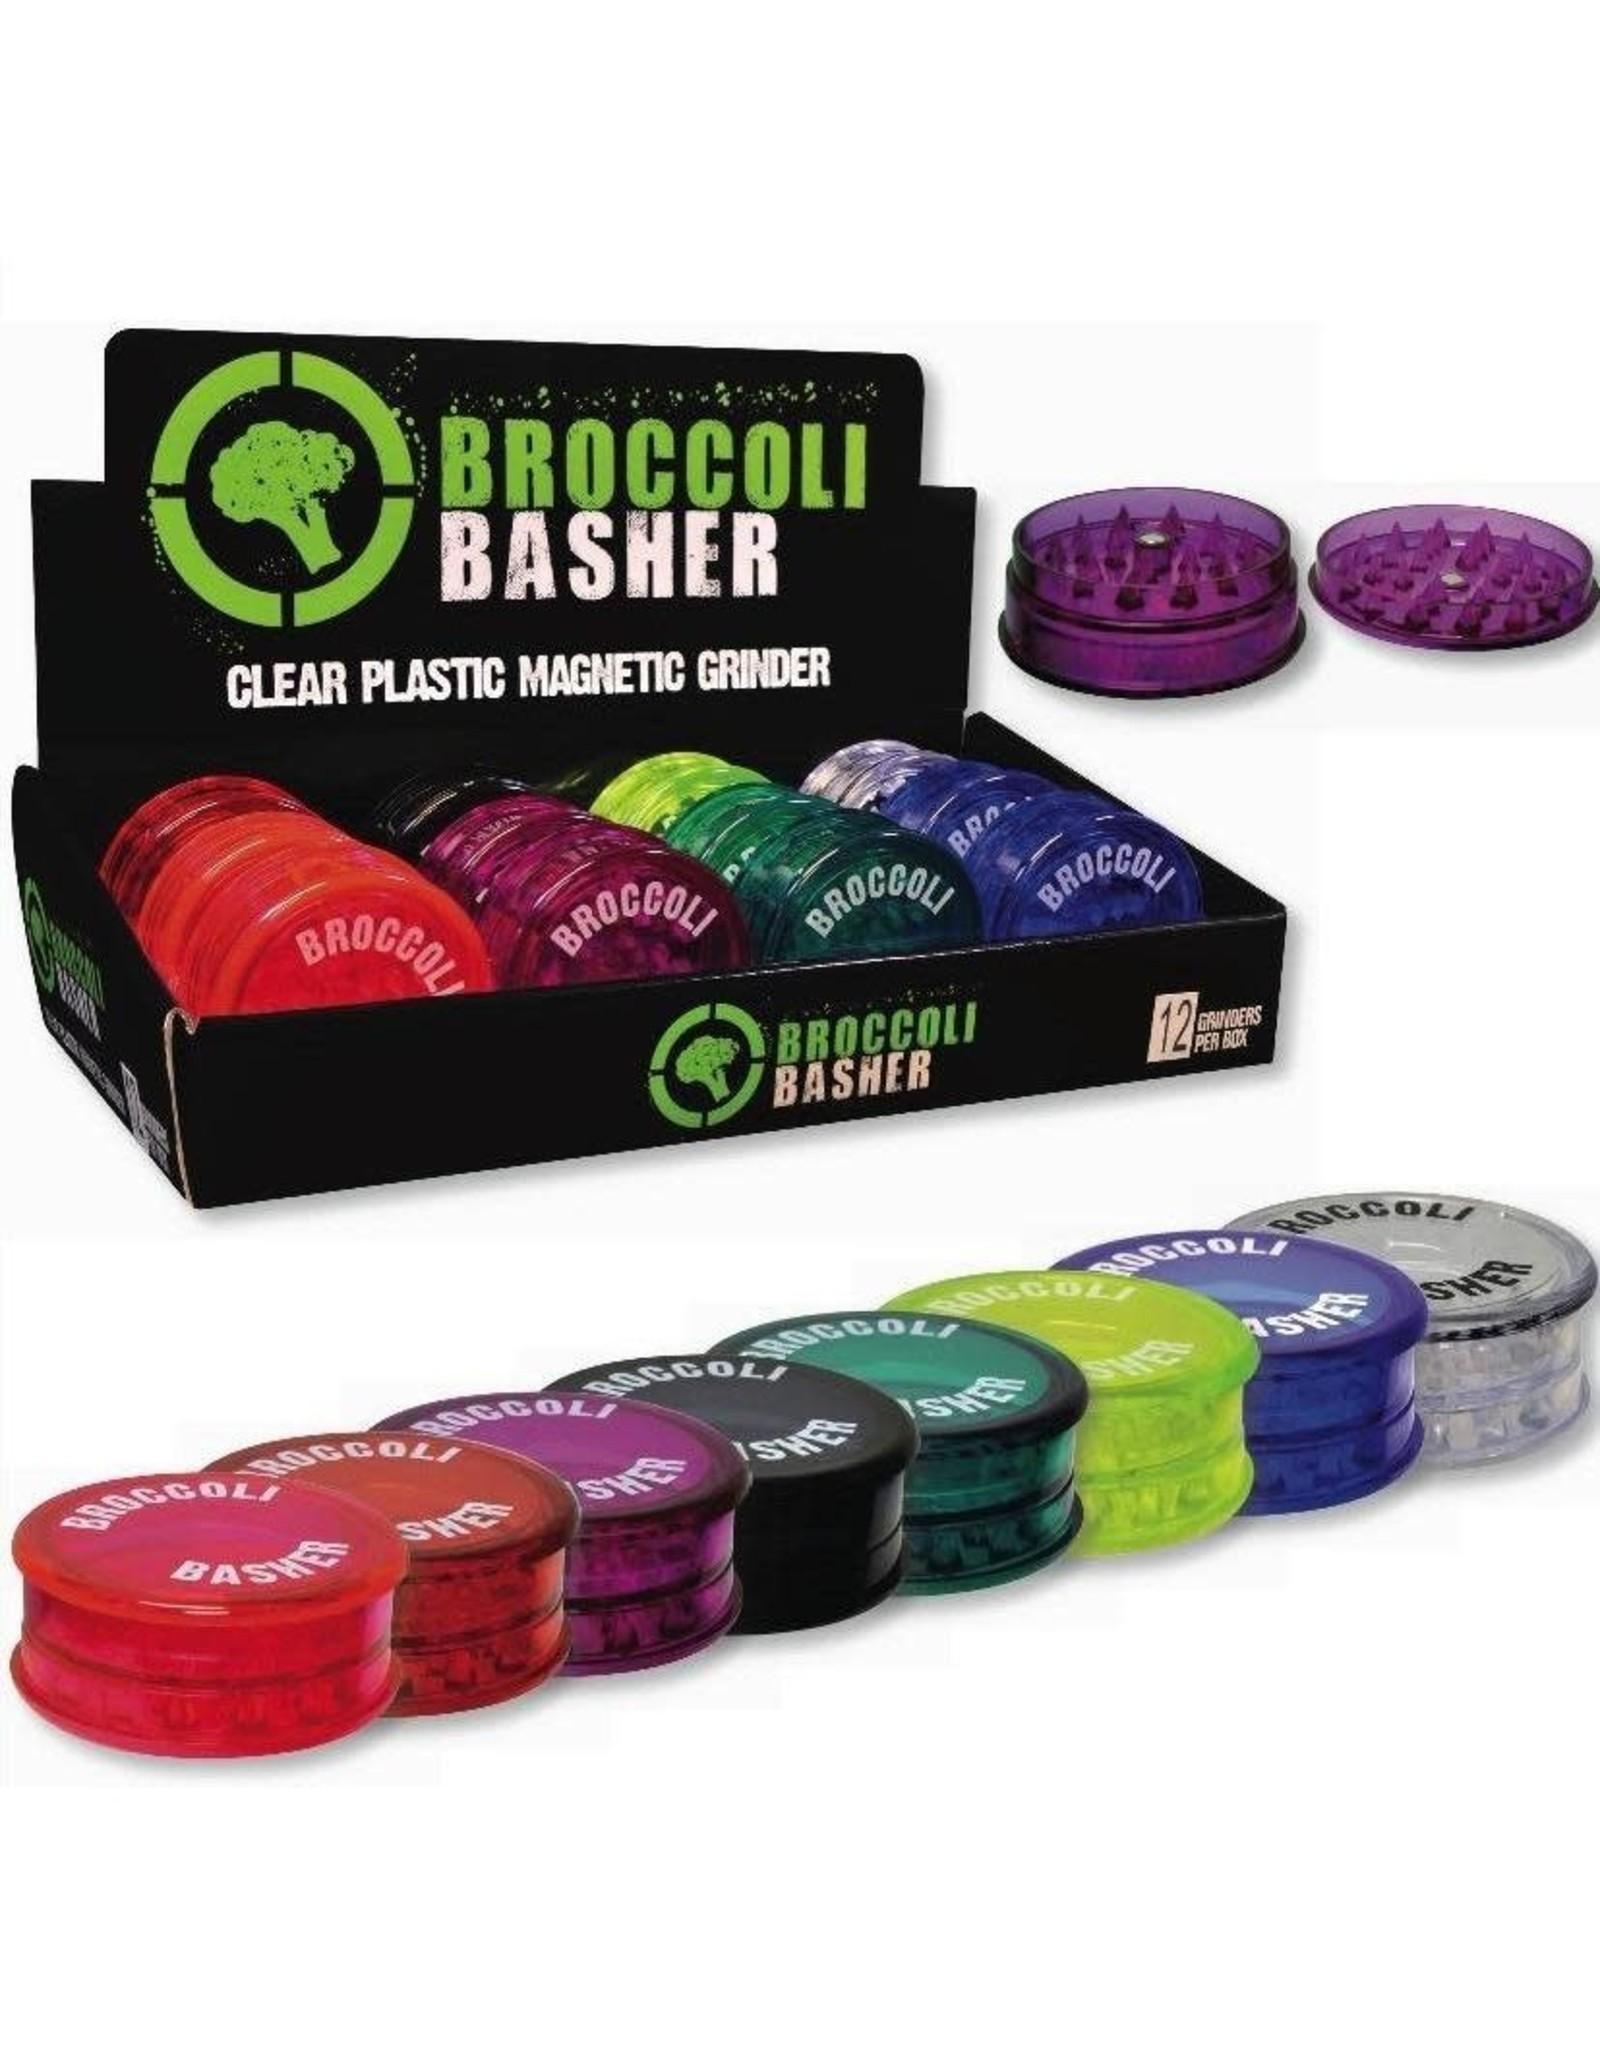 PLASTIC BROCCOLI BASHER CLEAR PLASTIC MAGNETIC GRINDER